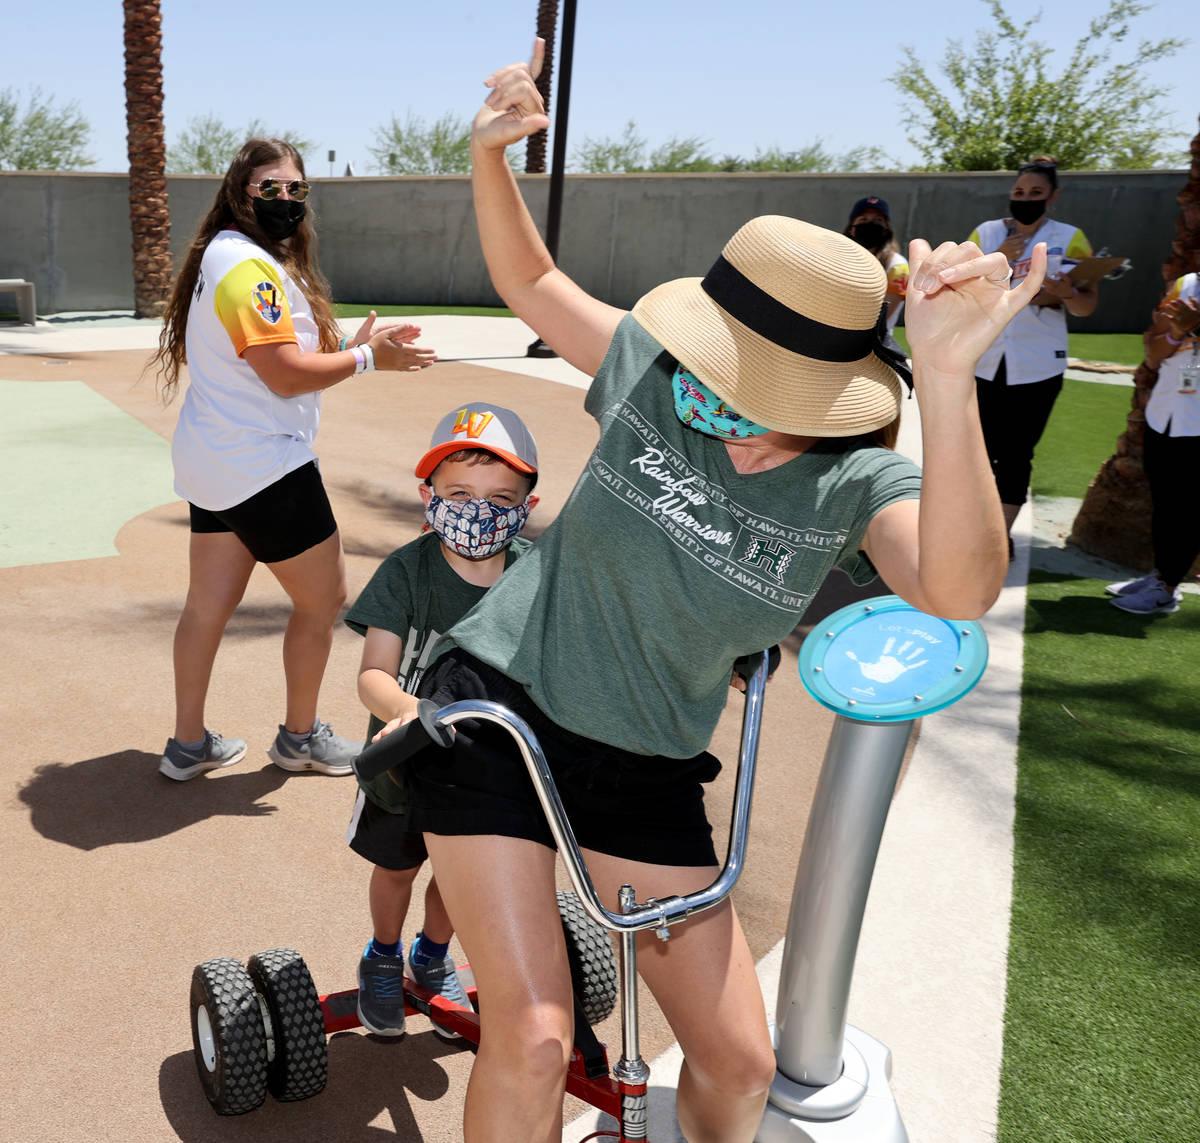 Rena Van Slyke and her son Dodge, 4, celebrate winning the tricycle race between innings as the ...